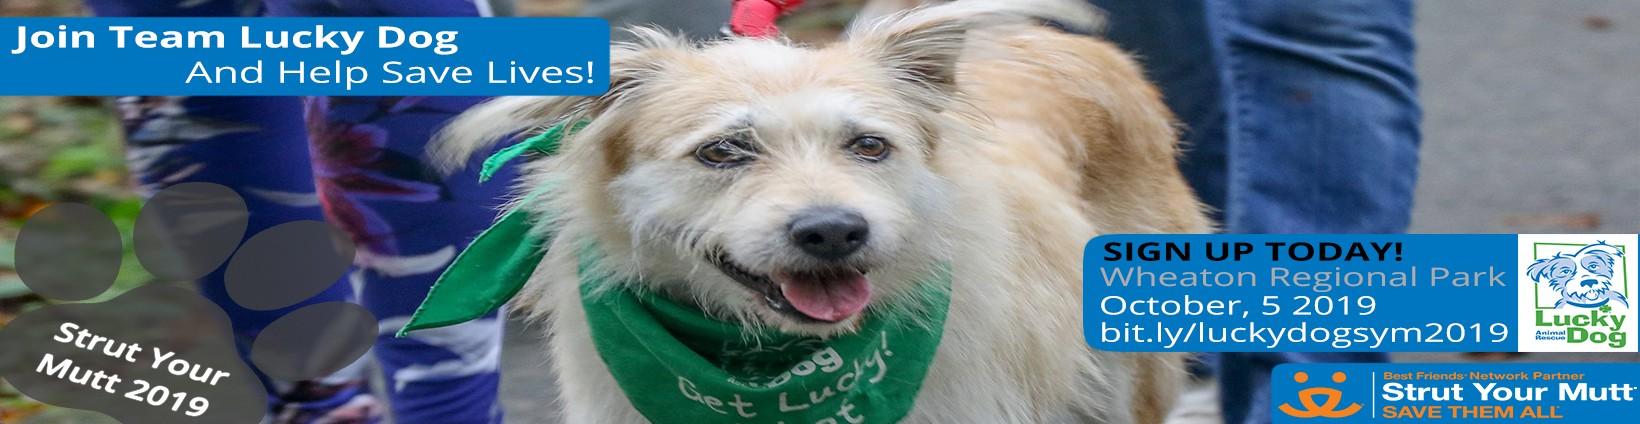 Lucky Dog Animal Rescue   LinkedIn